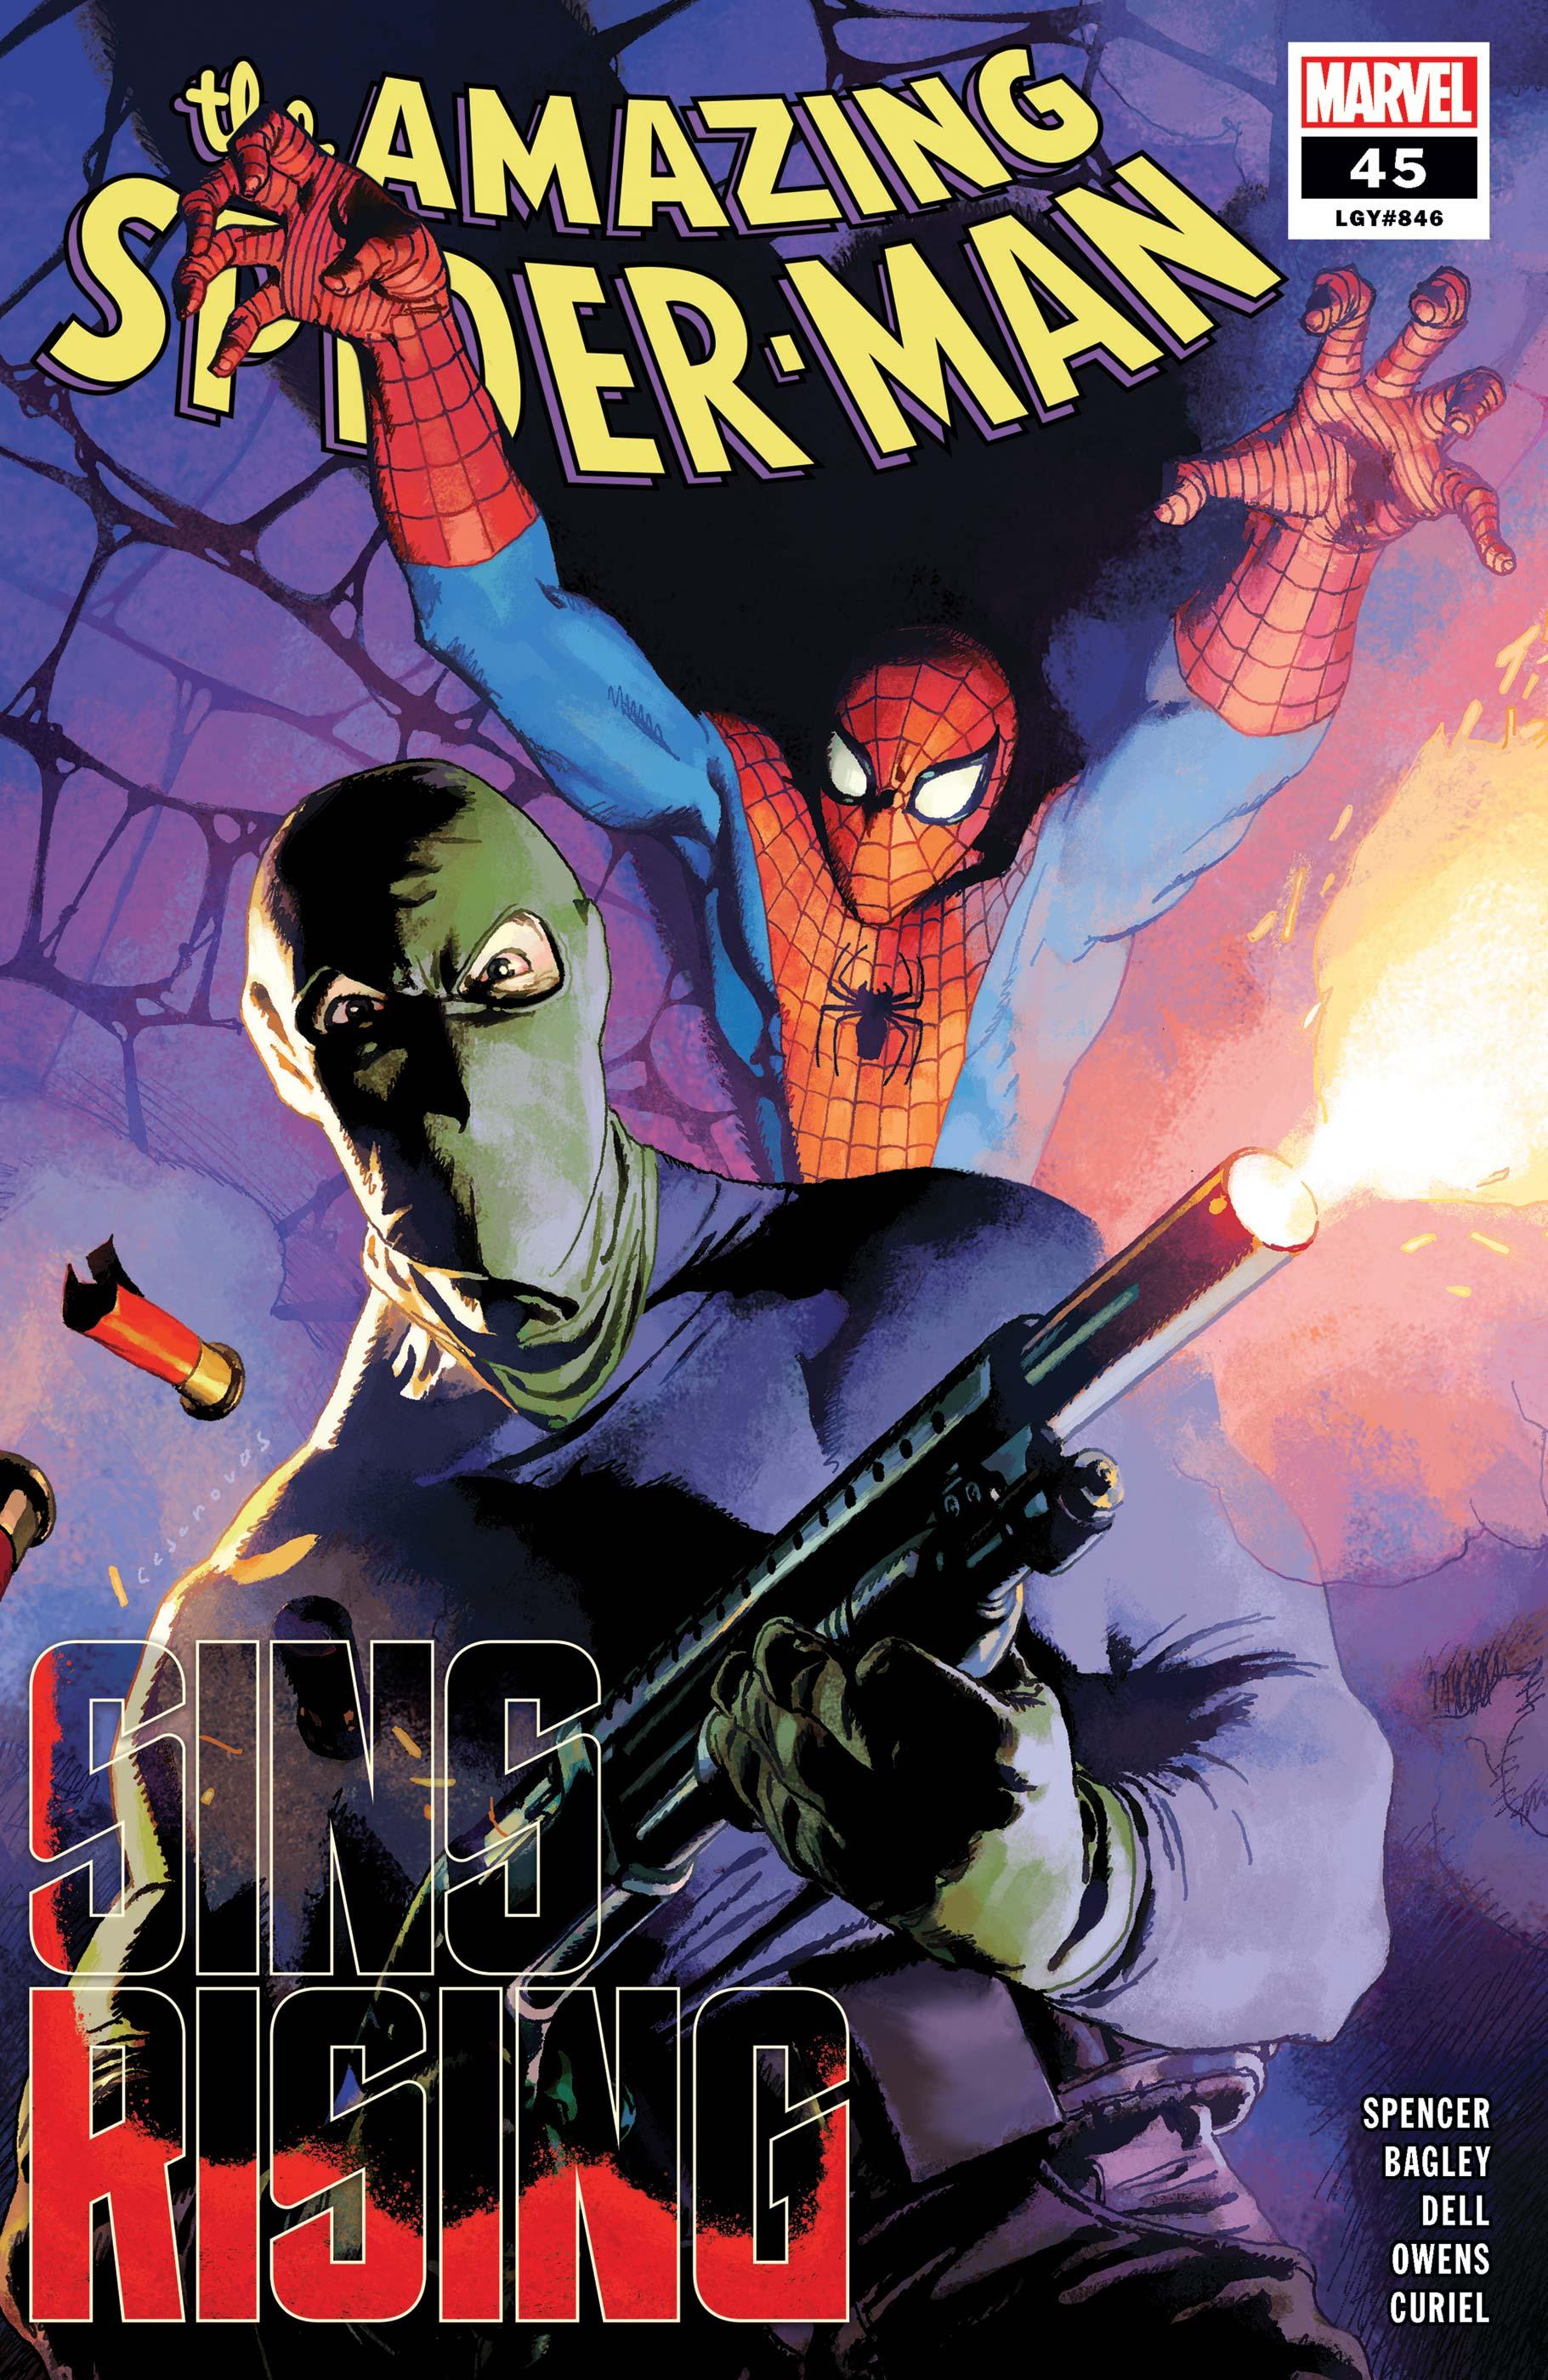 The Amazing Spider-Man (2018) #45